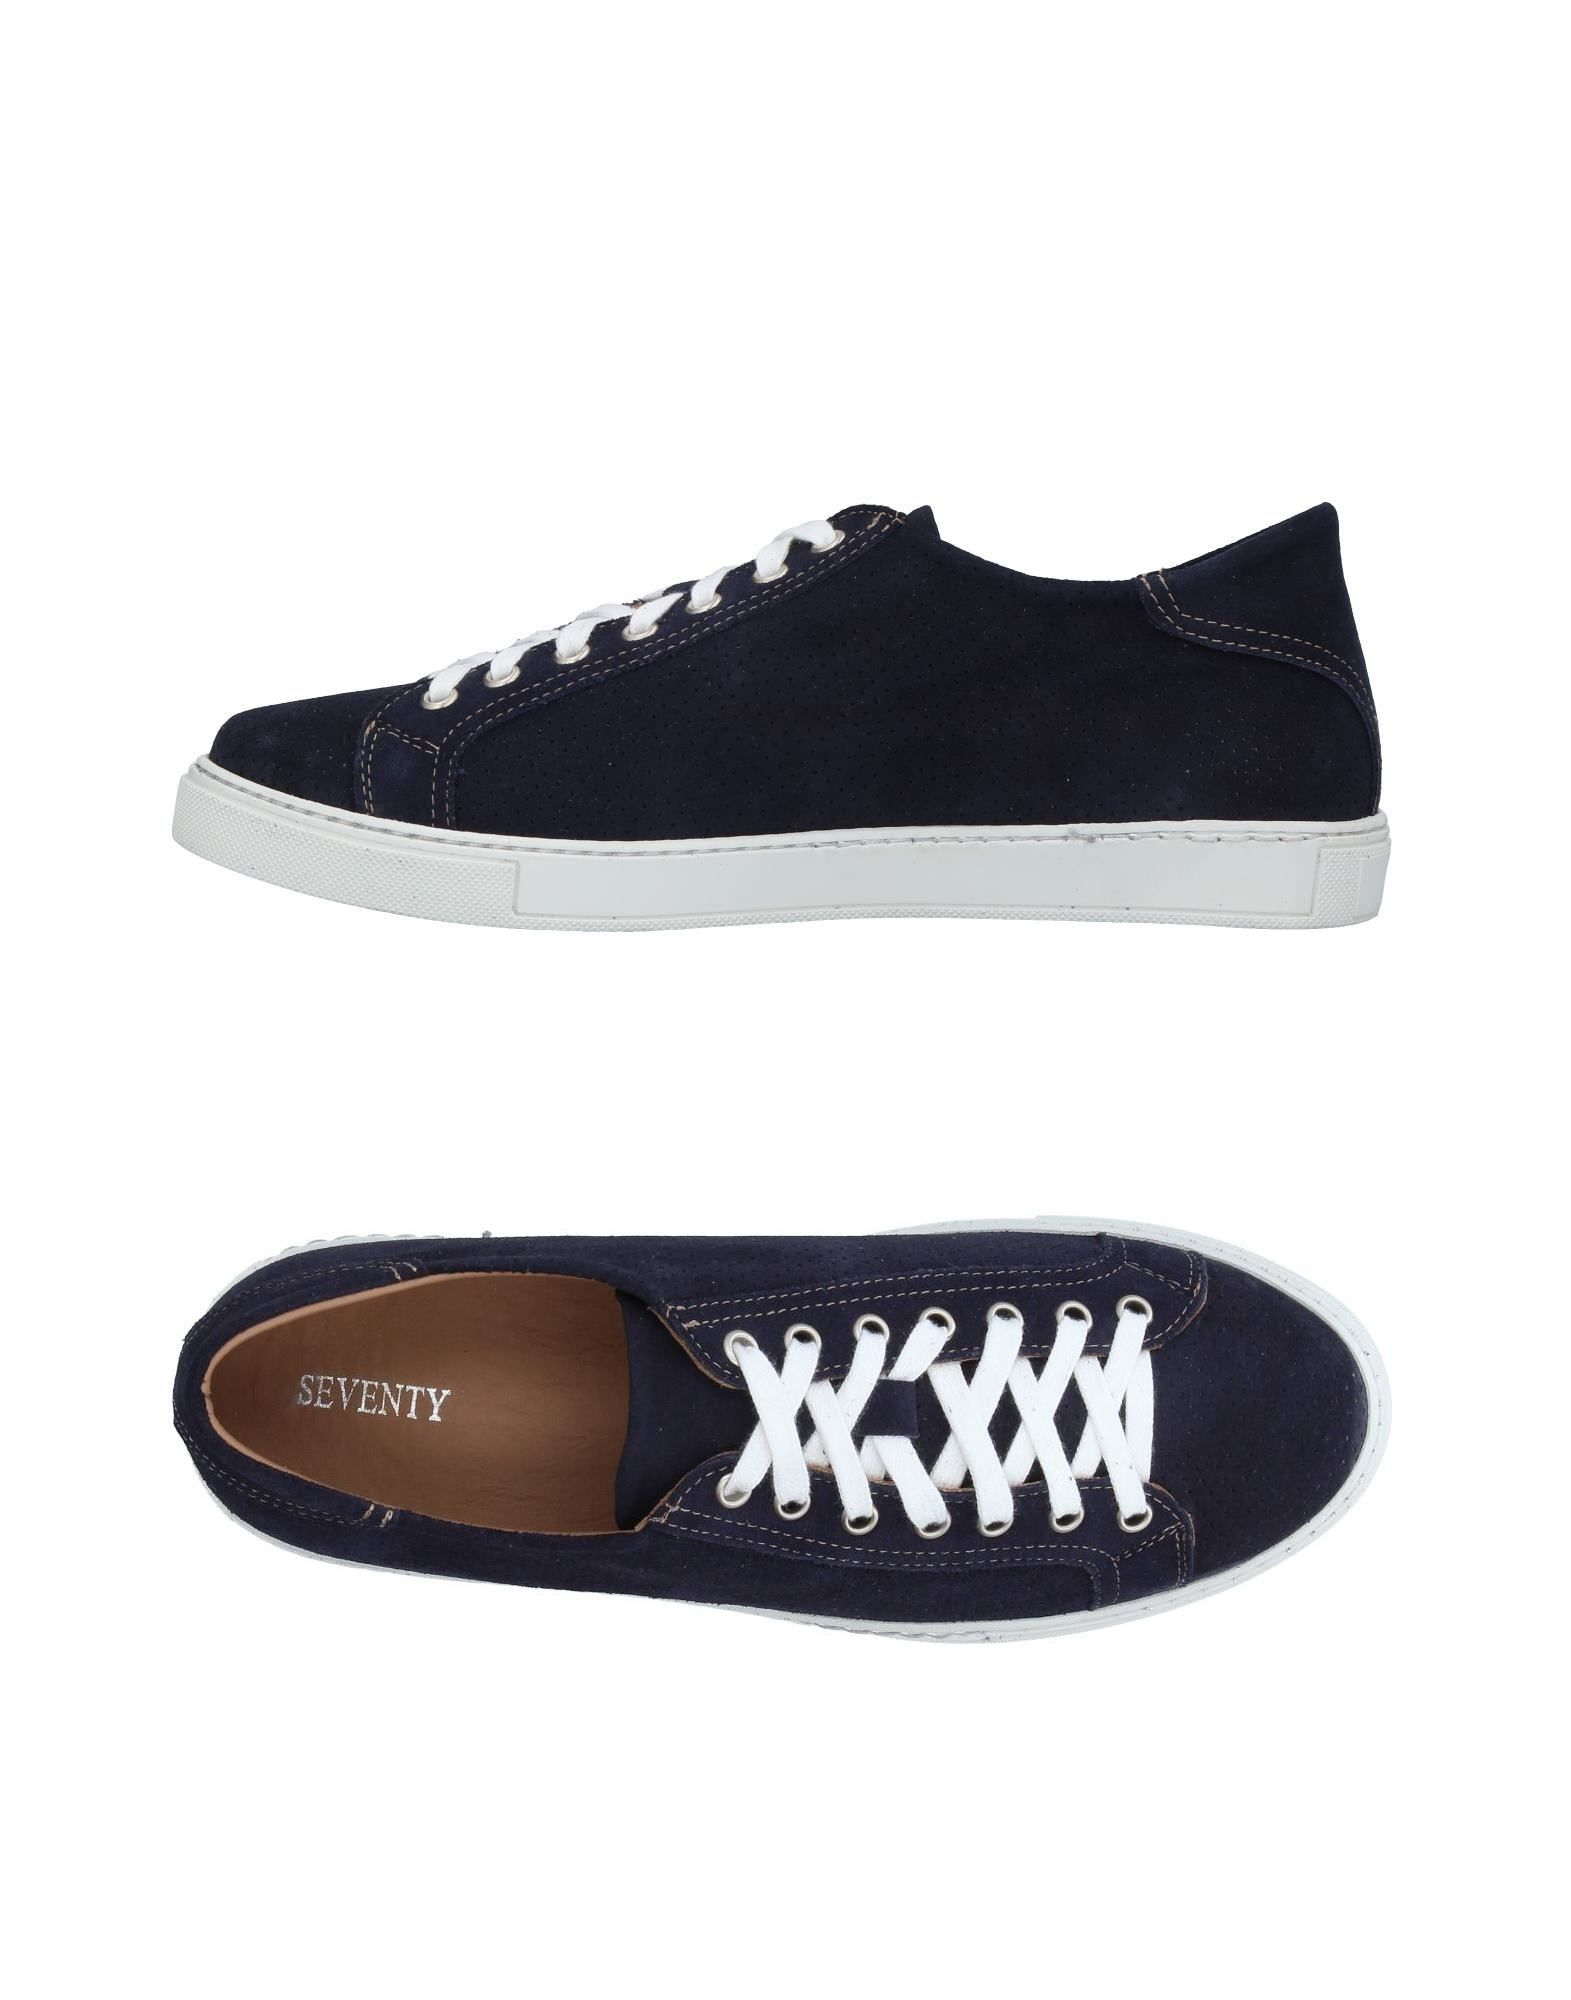 Sneakers Seventy Sergio Tegon Homme - Sneakers Seventy Sergio Tegon sur